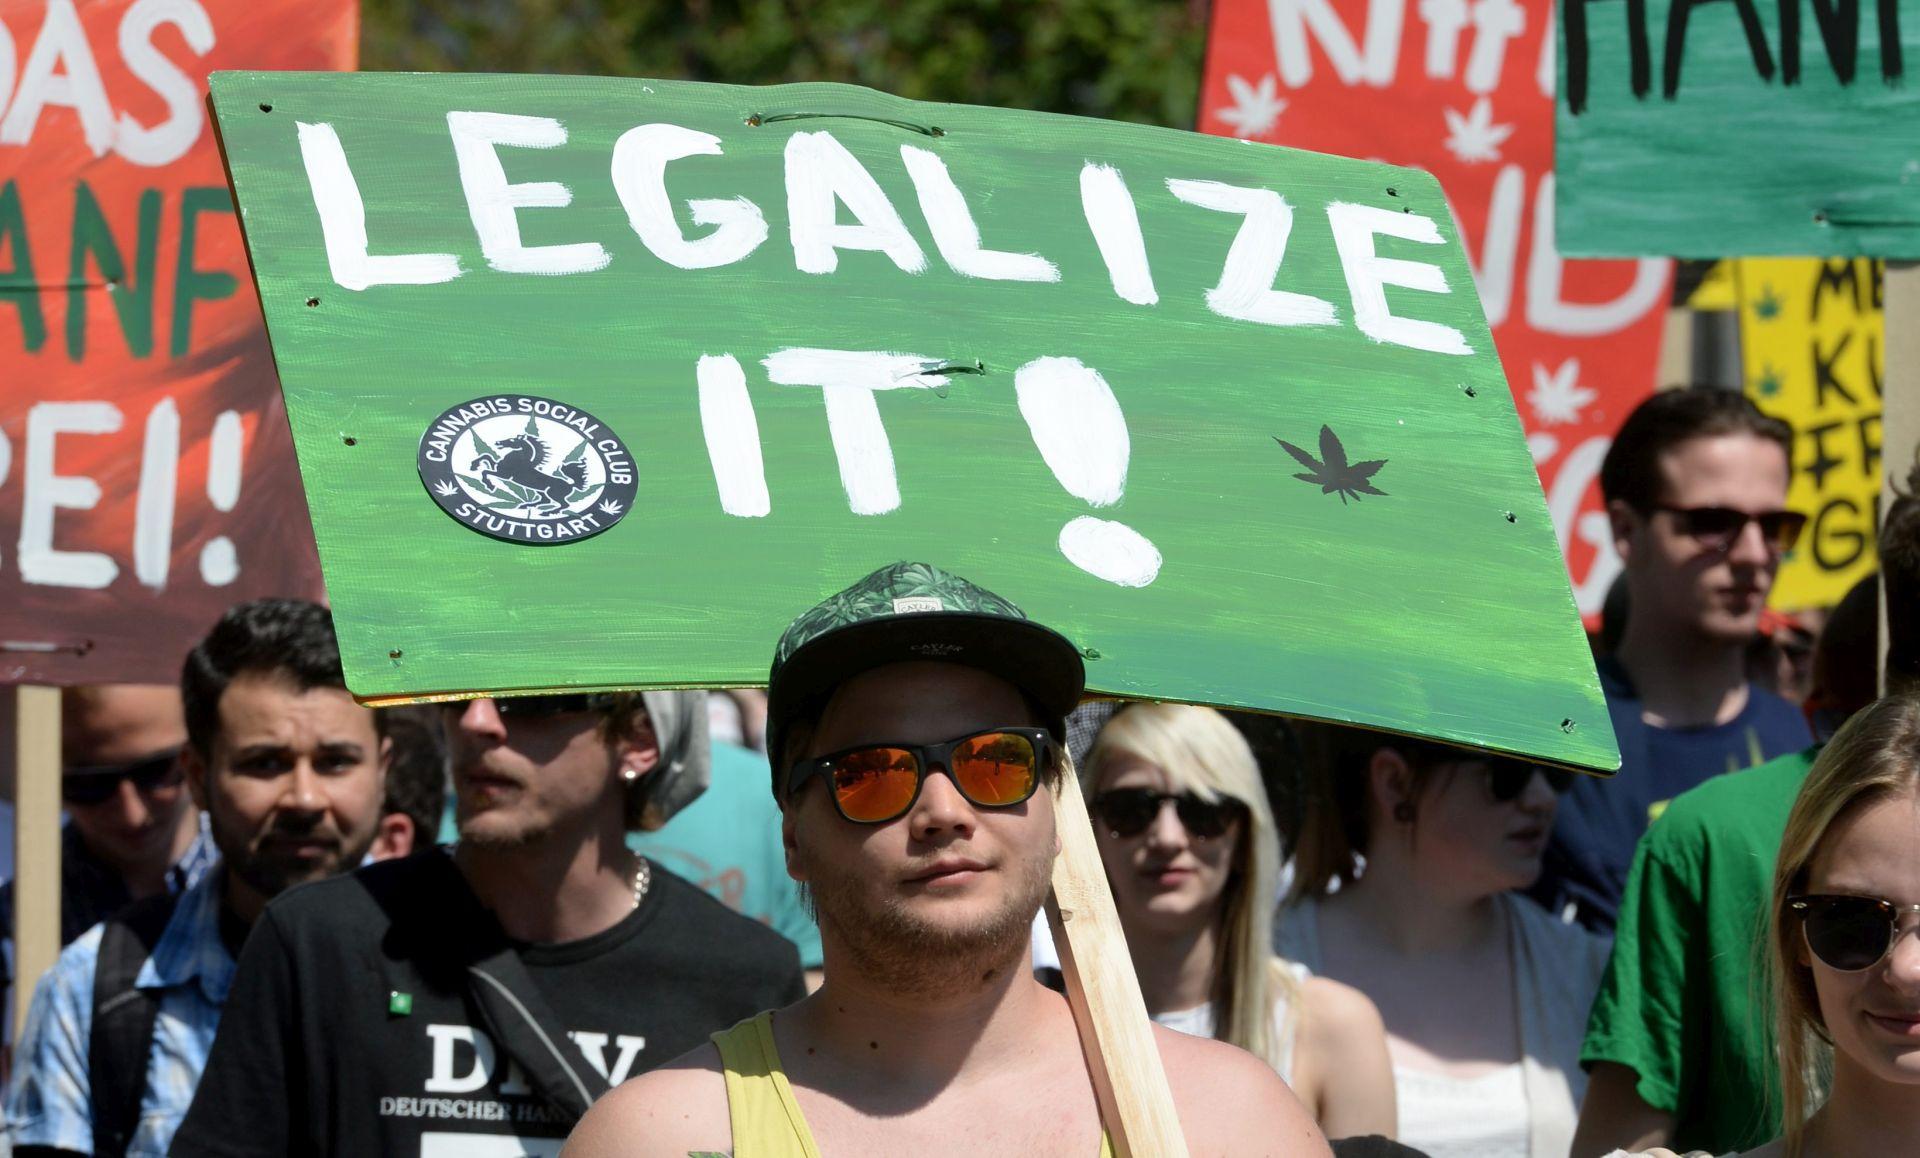 KALIFORNIJA Za legalizaciju marihuane glasalo 55 posto birača